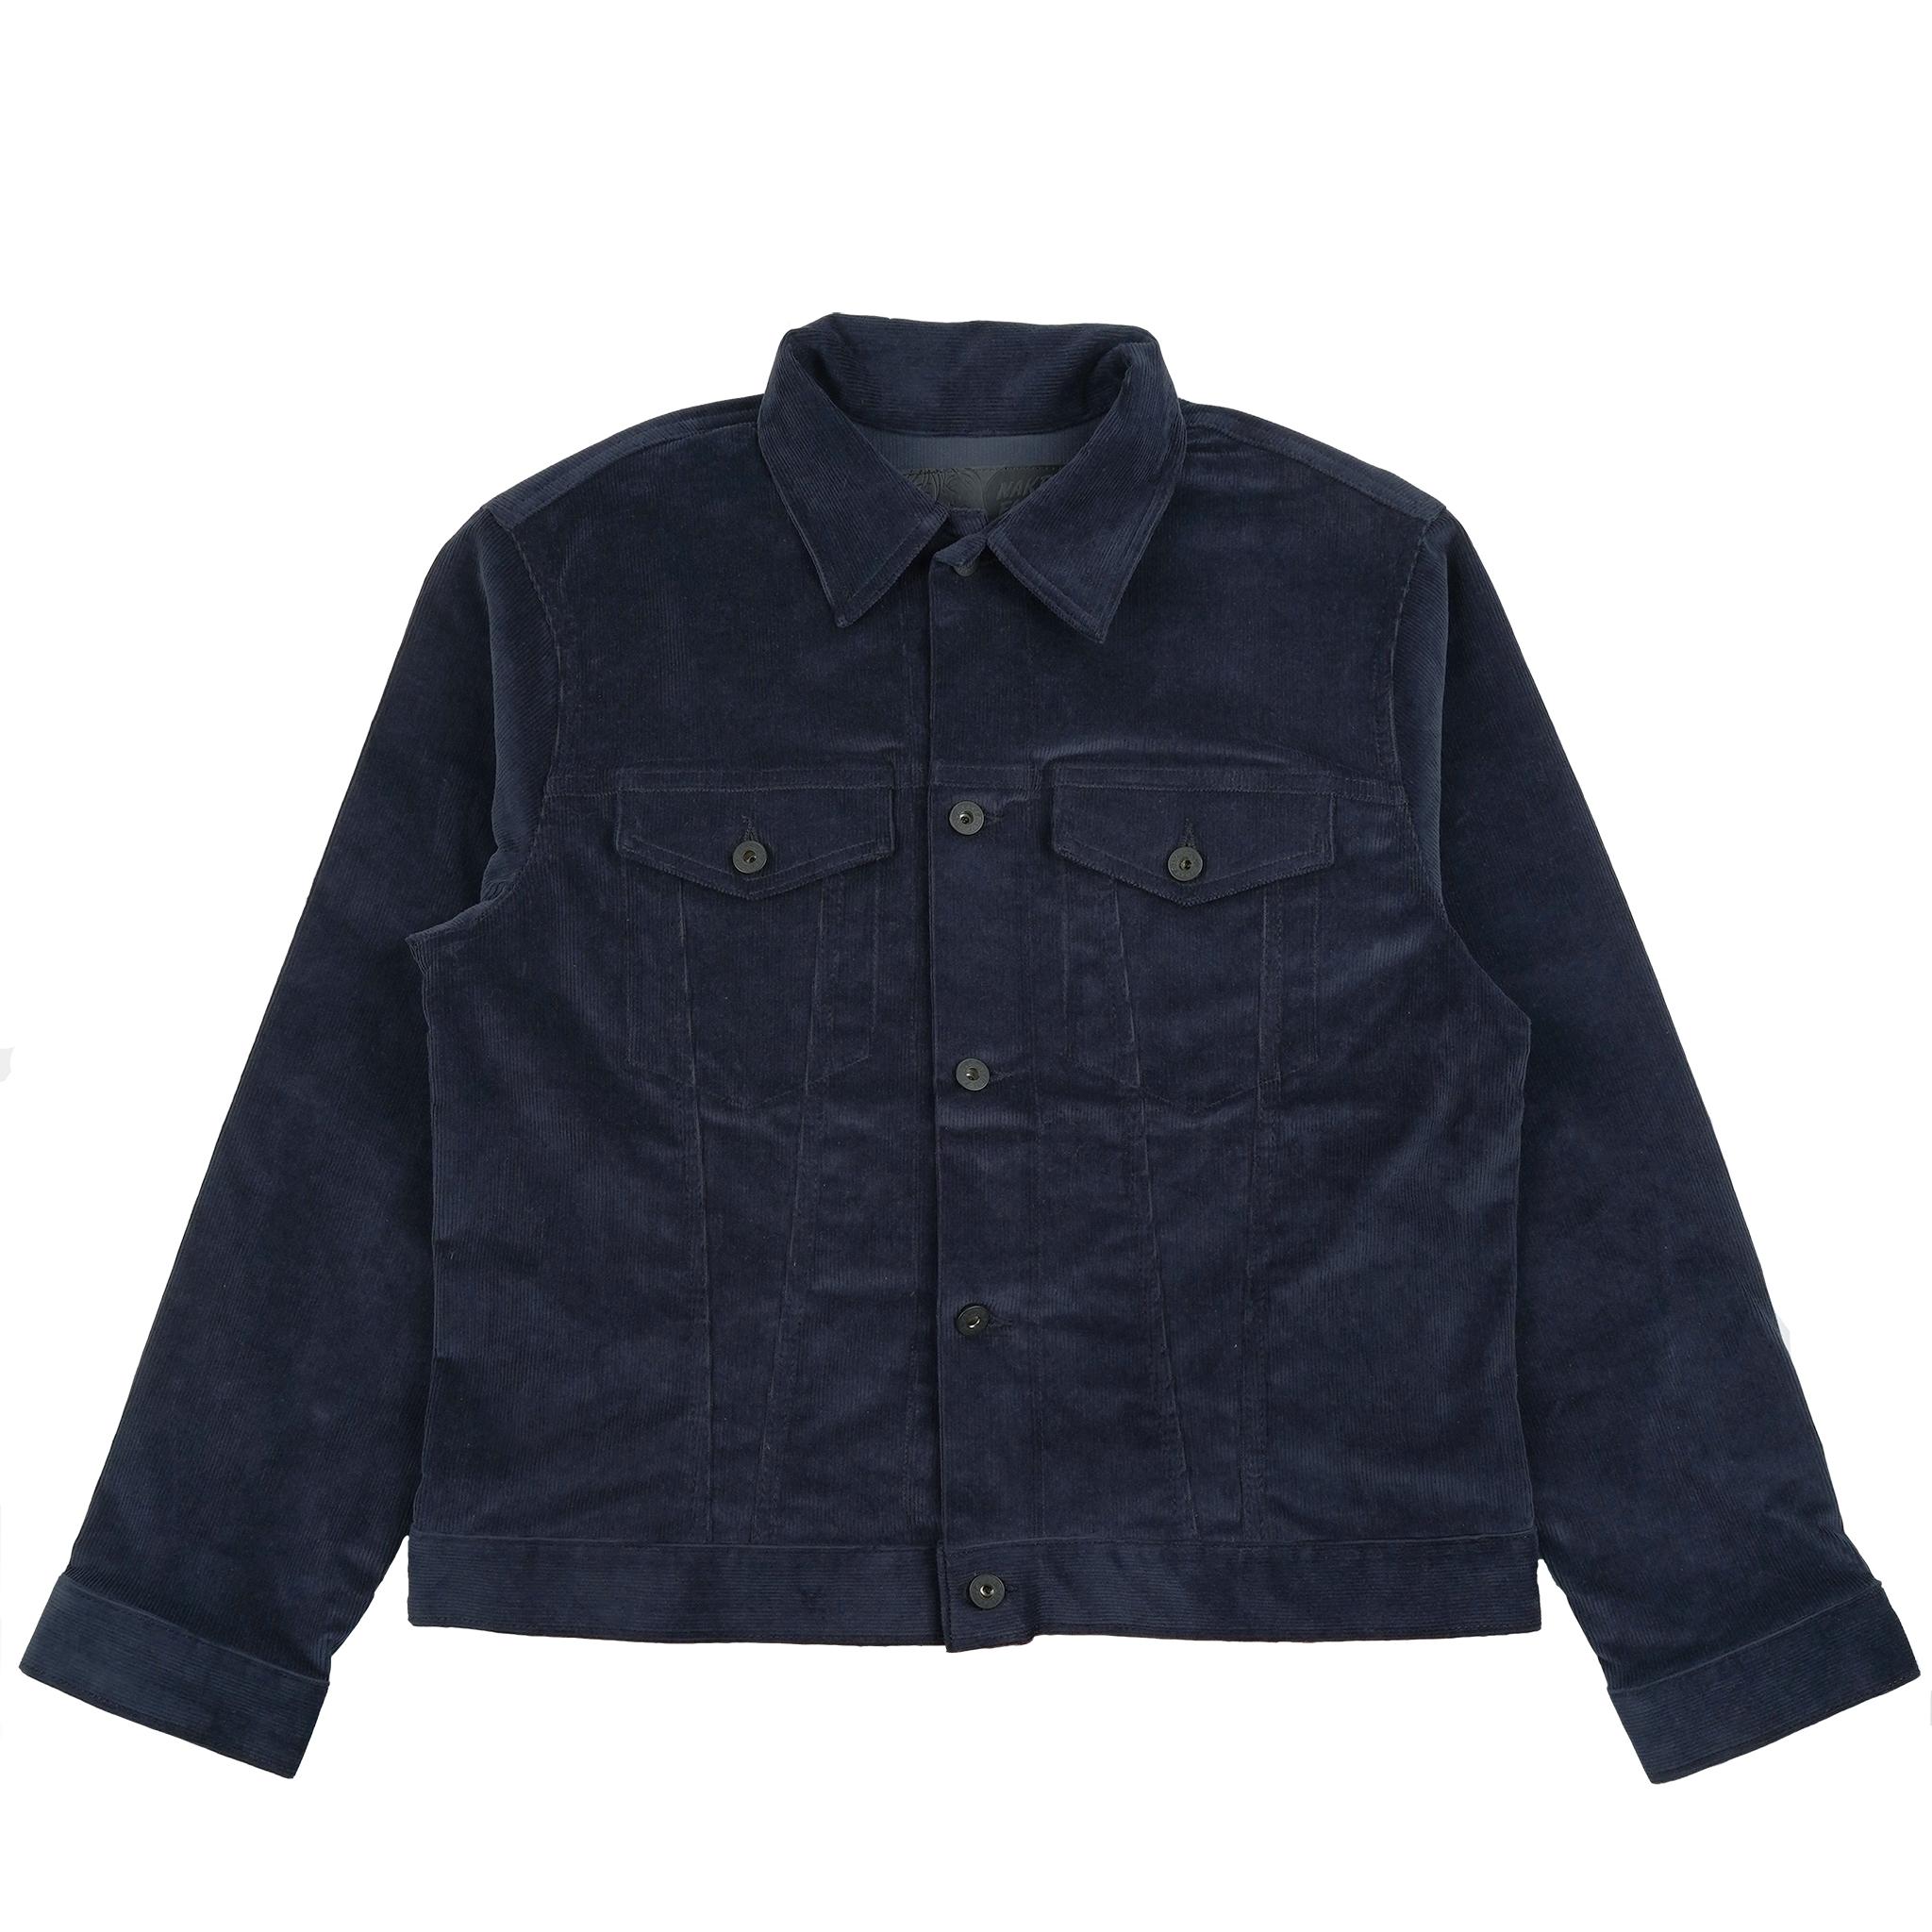 Indigo Corduroy - Denim Jacket